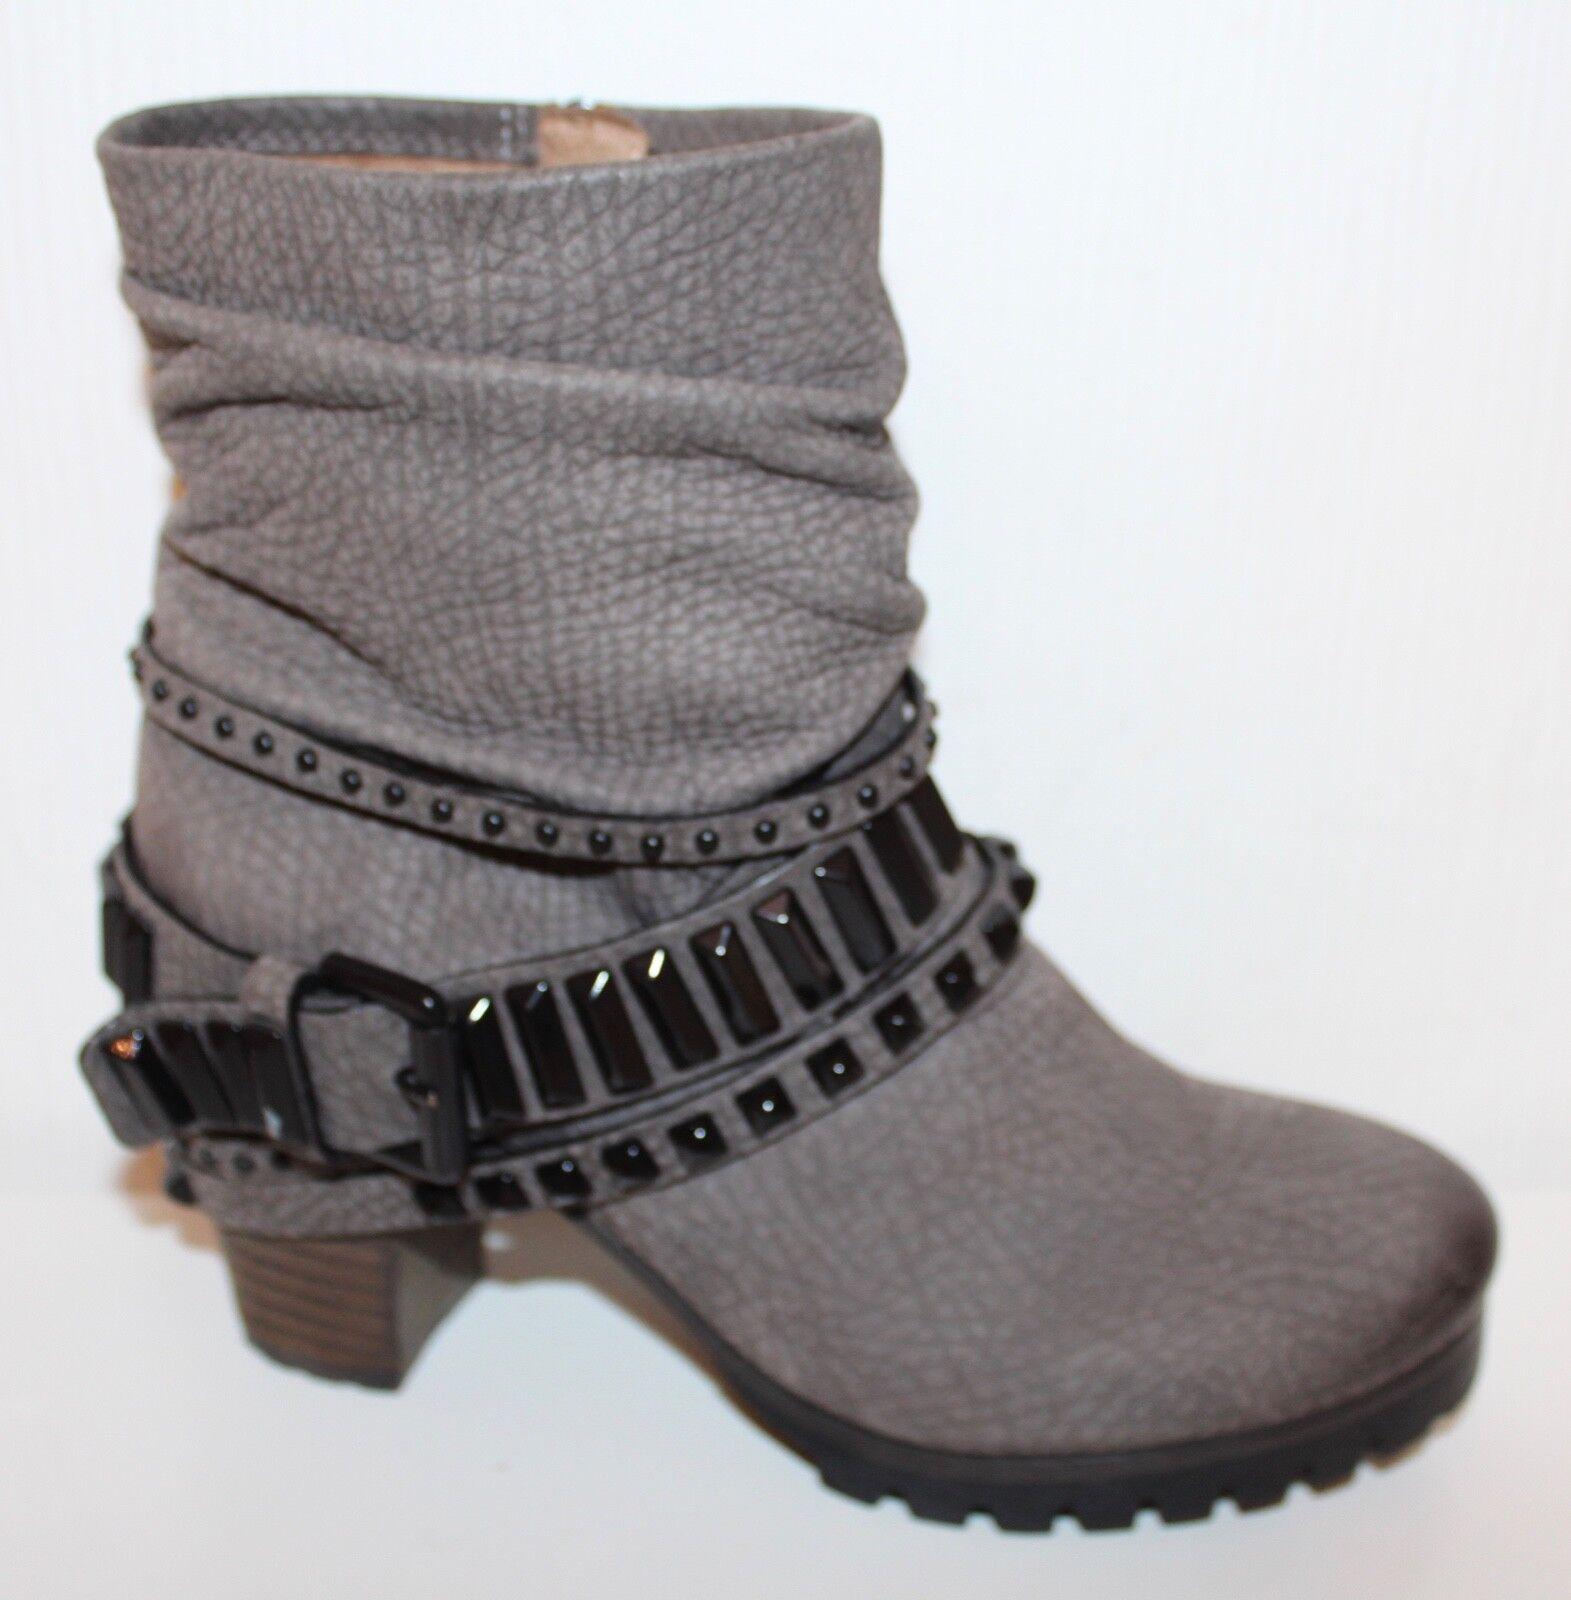 Kennel & schmenger K + S cuero botines botines botines botaies 36 botines botas Taupe  mas preferencial